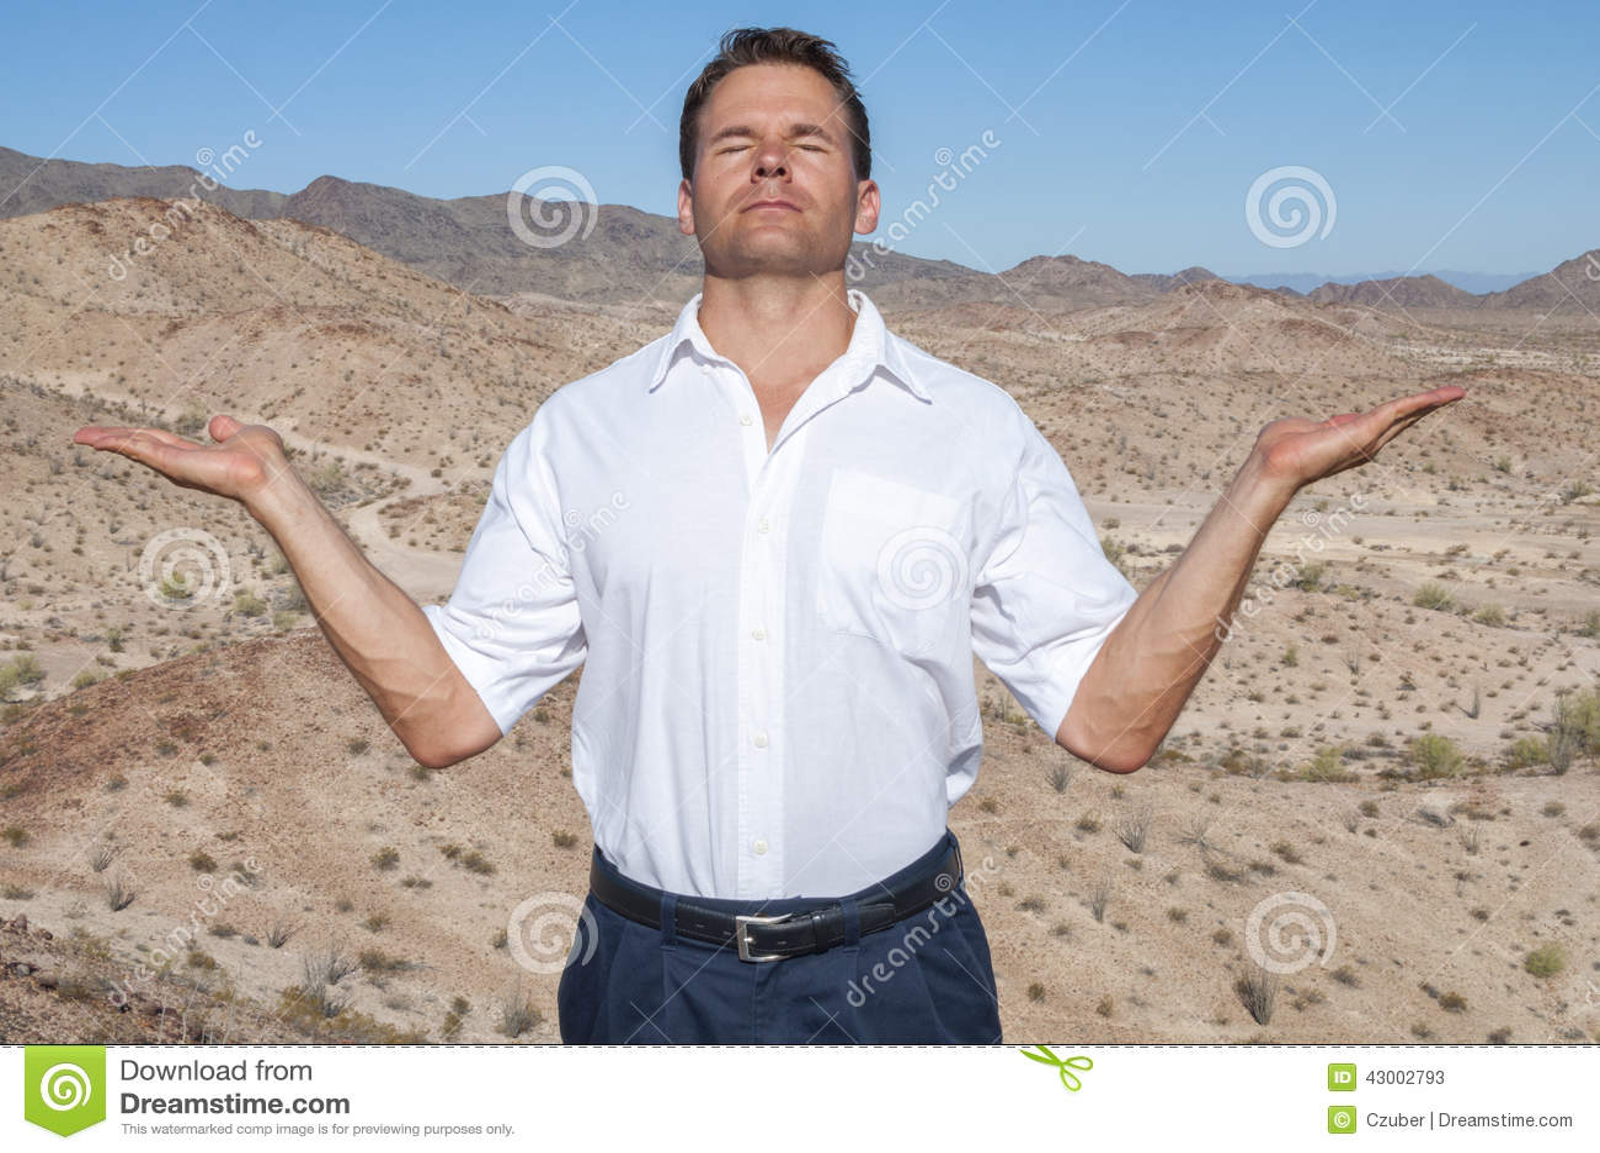 Meditation in desert stock image  Image of casual, heaven - 43002793